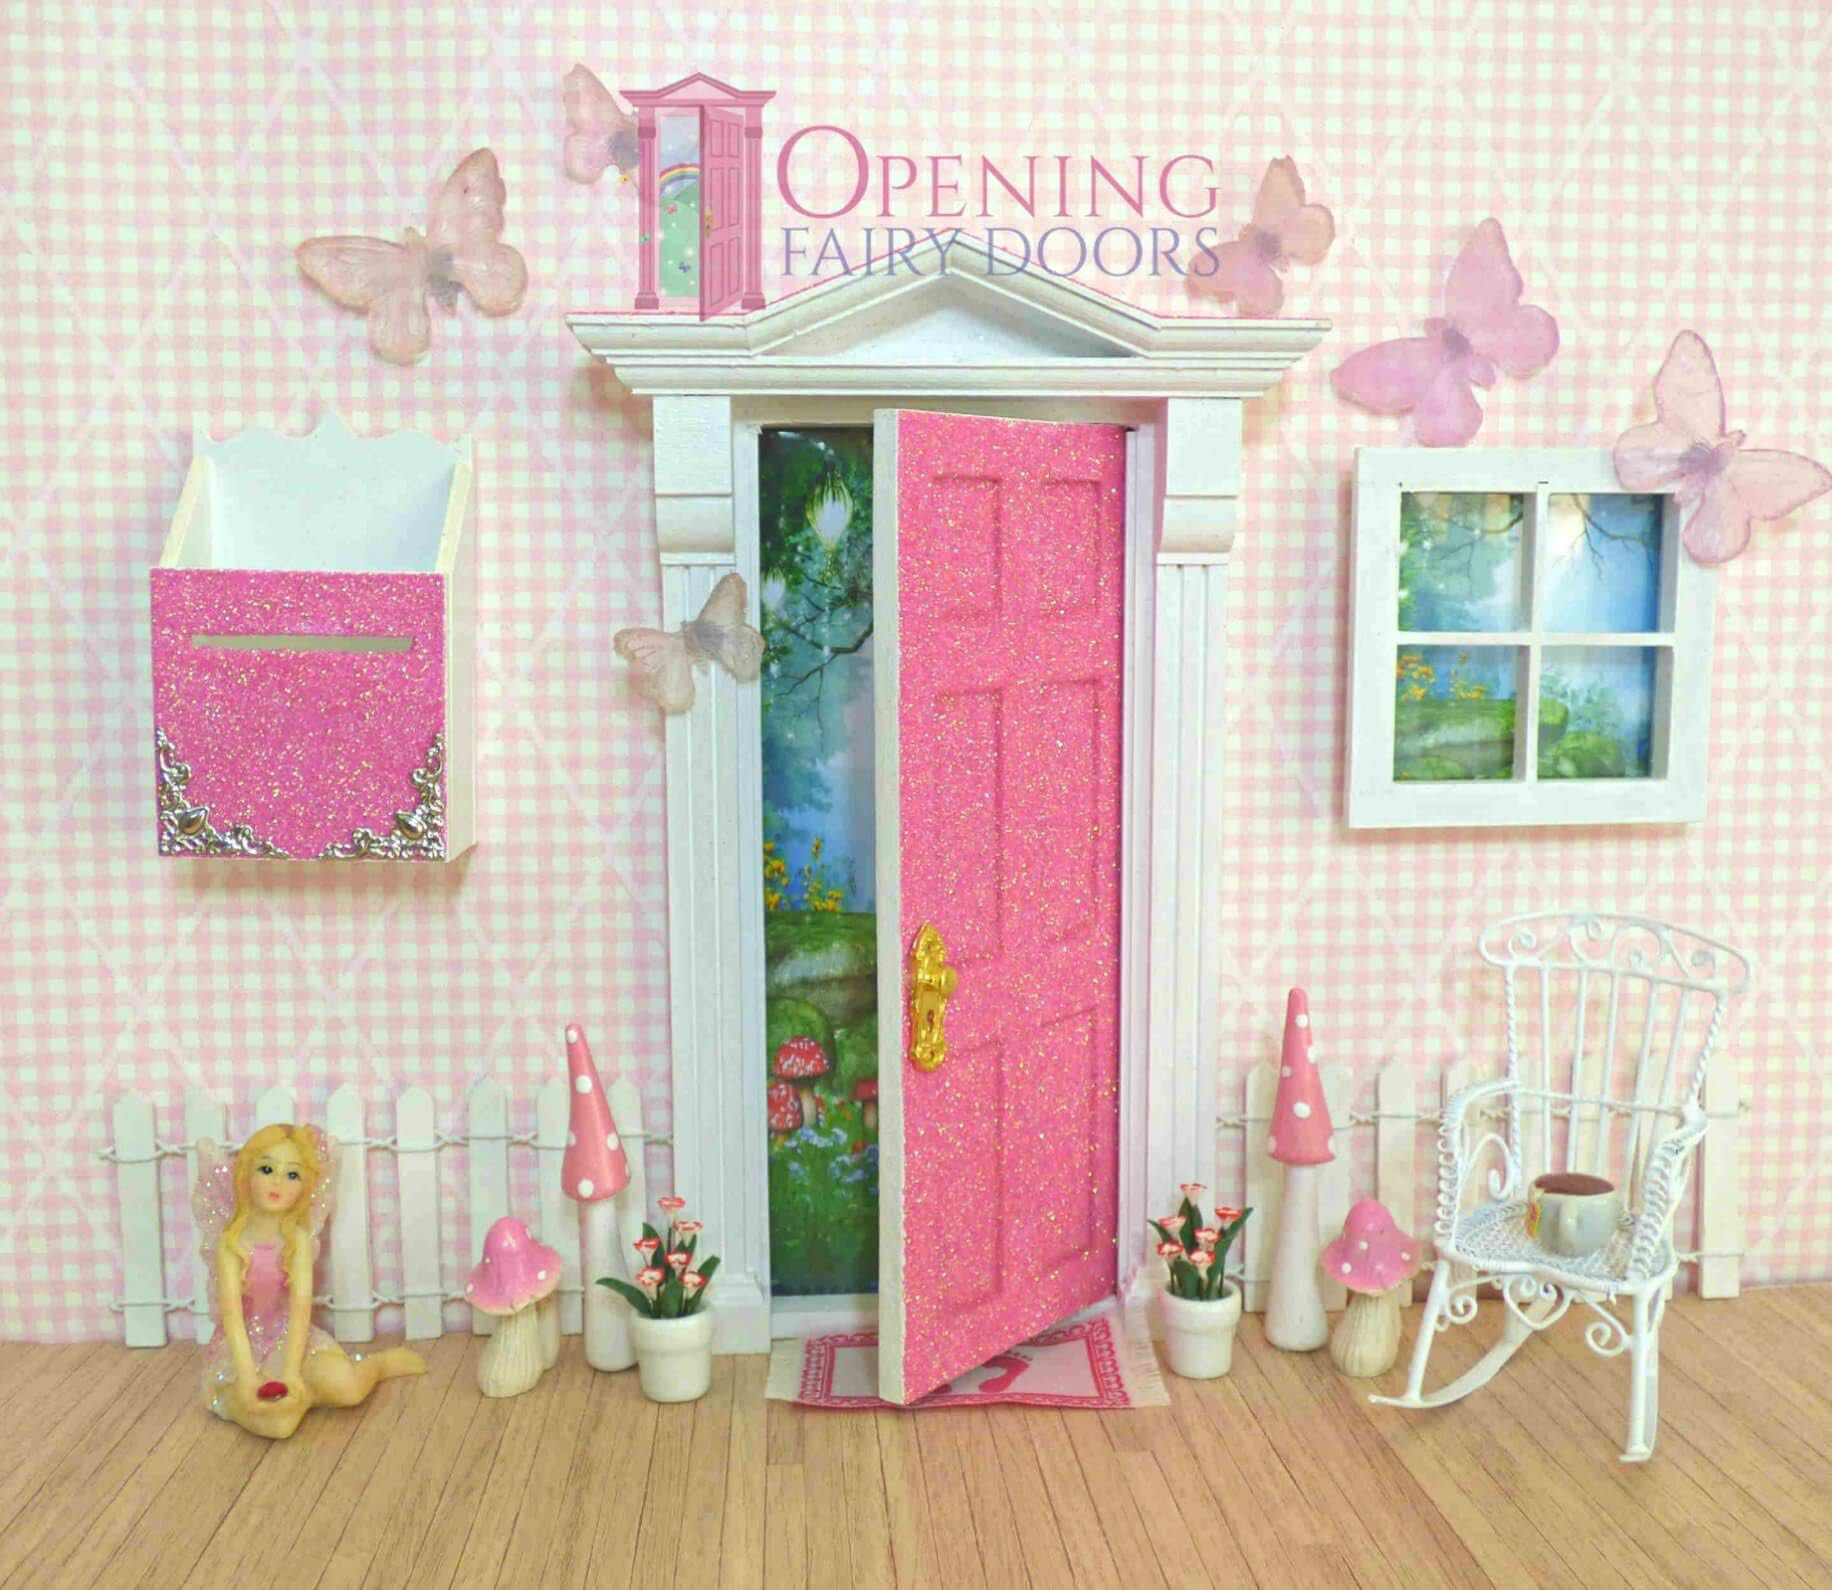 Opening Fairy Doors Clipground